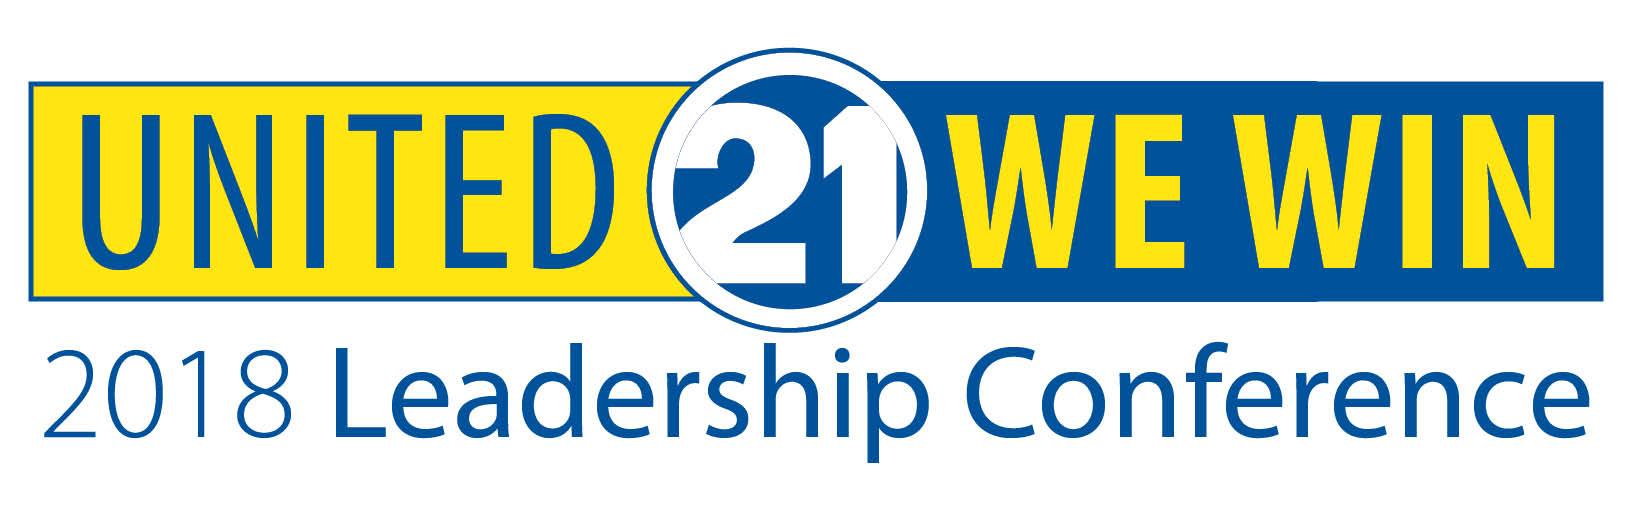 2018 Leadership Conference logo FINAL.jpg